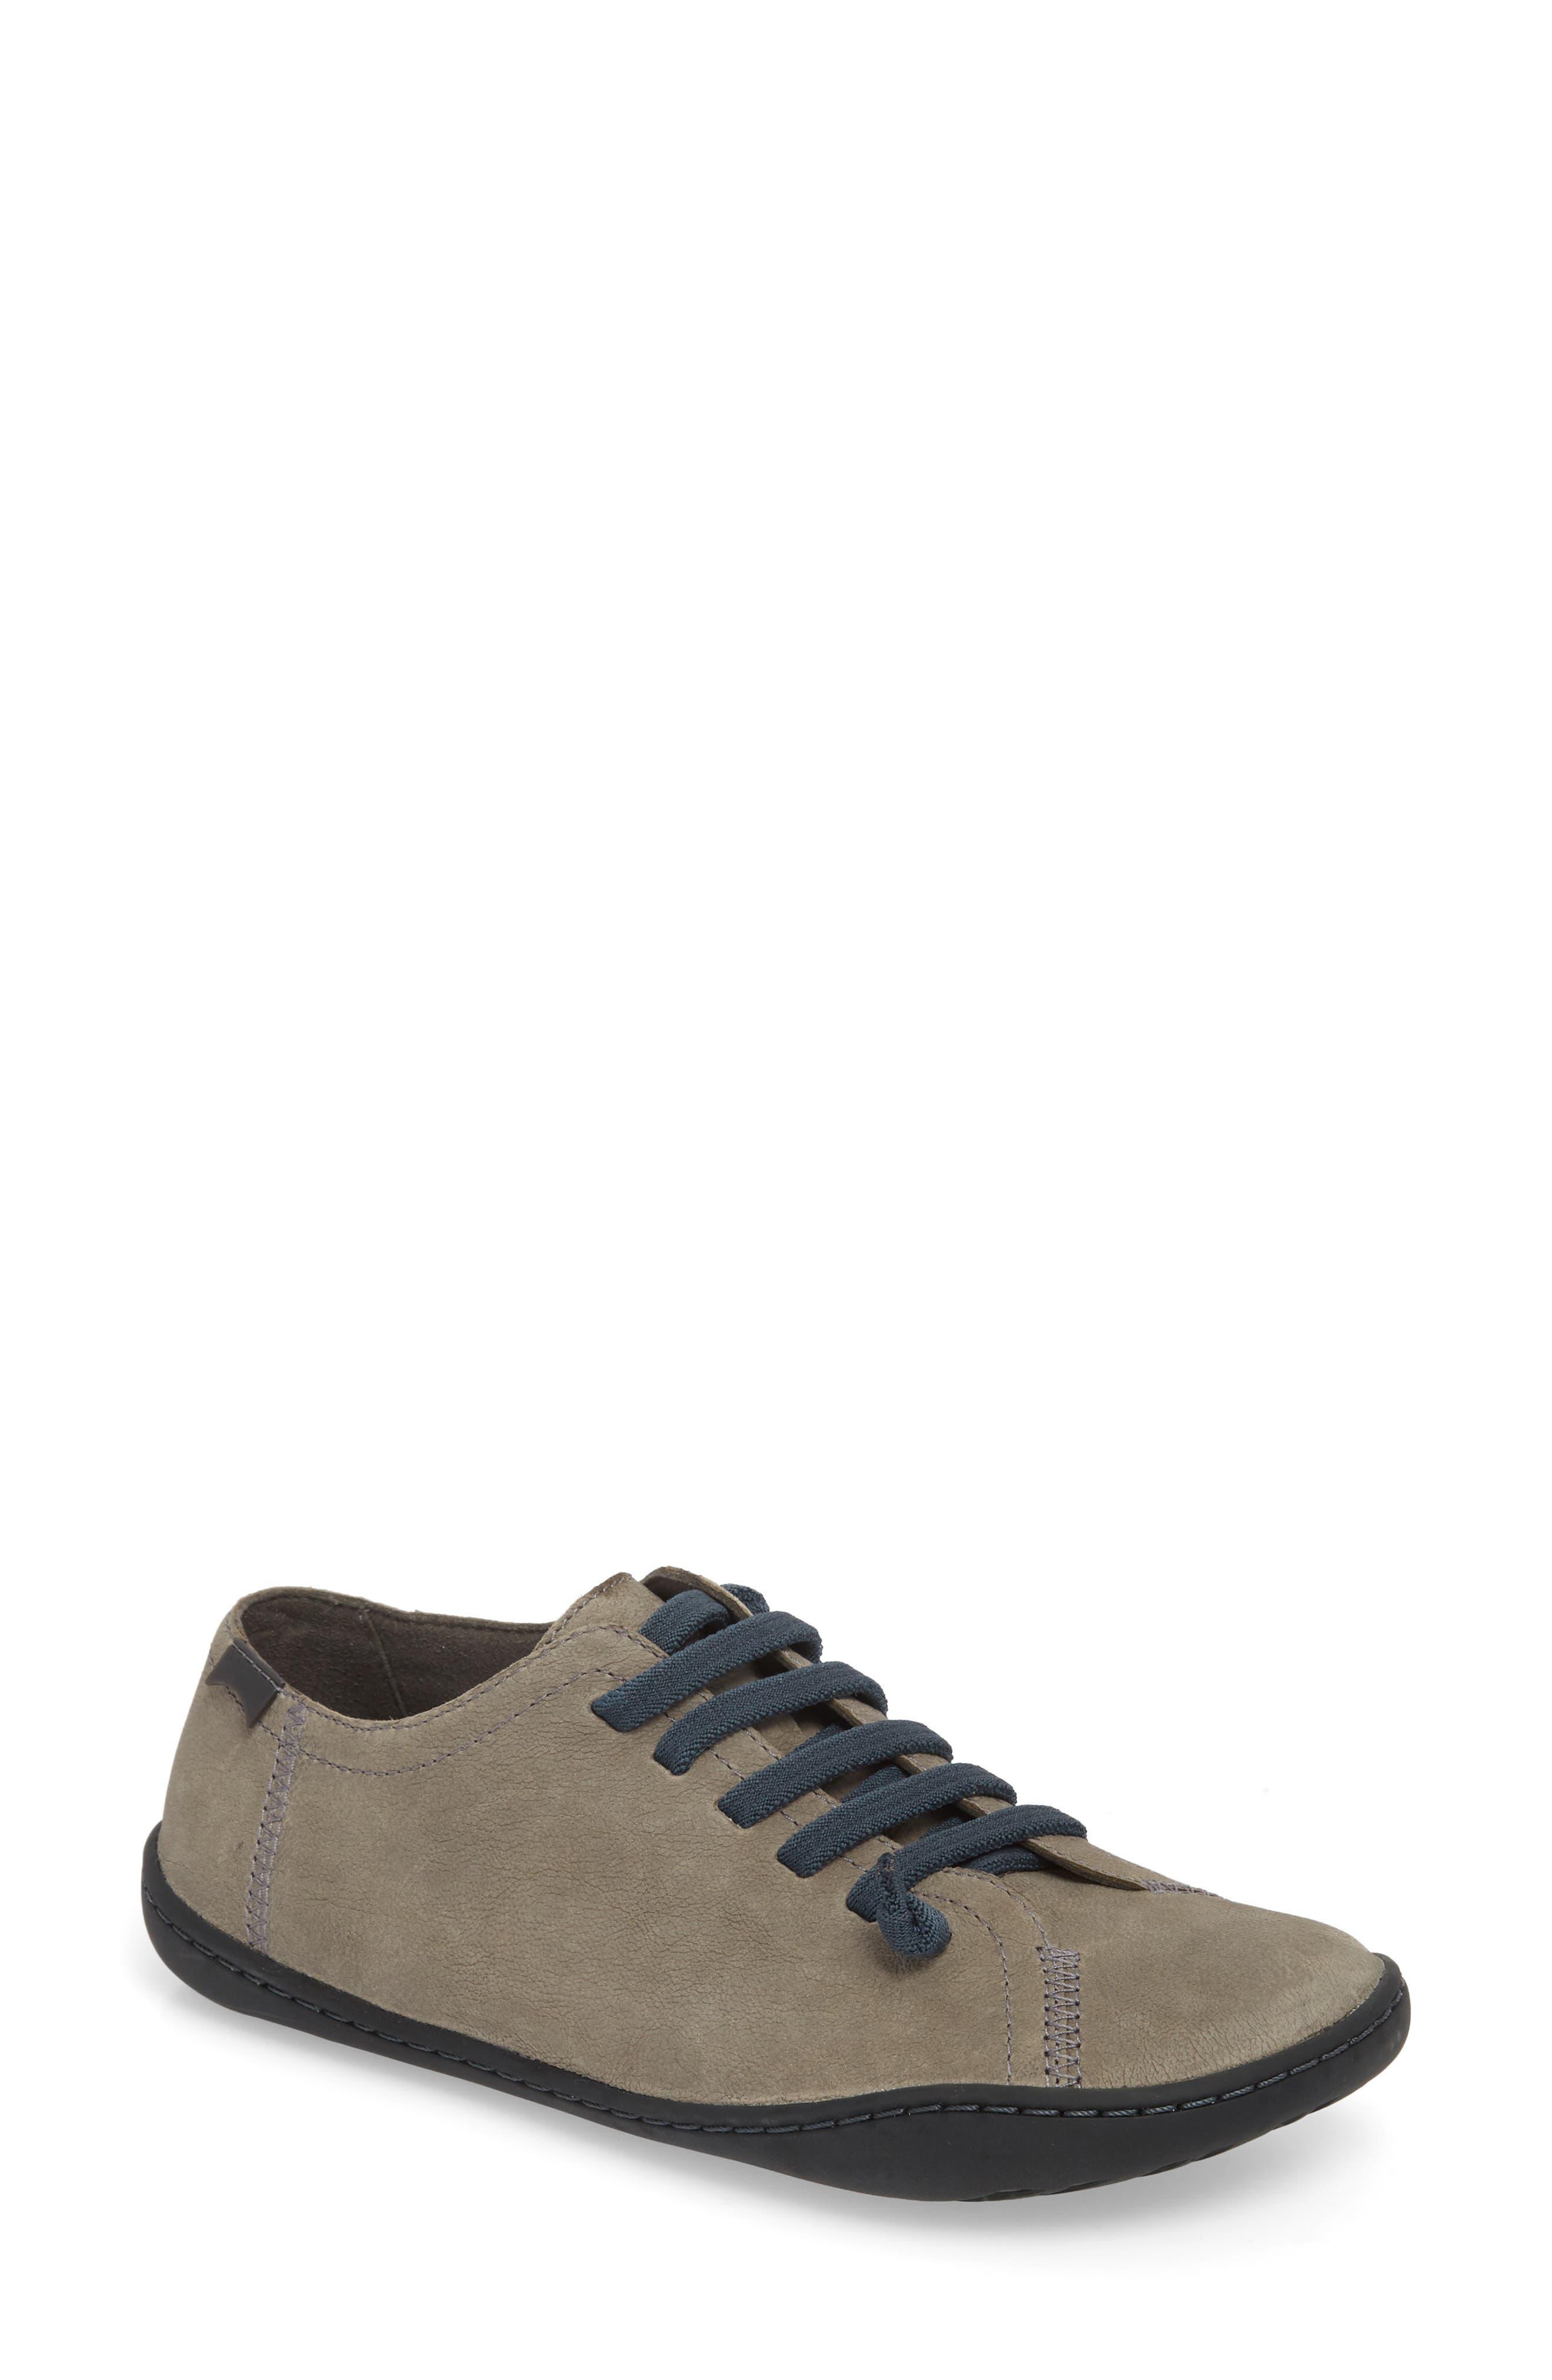 Peu Cami Sneaker,                             Main thumbnail 1, color,                             GRAY